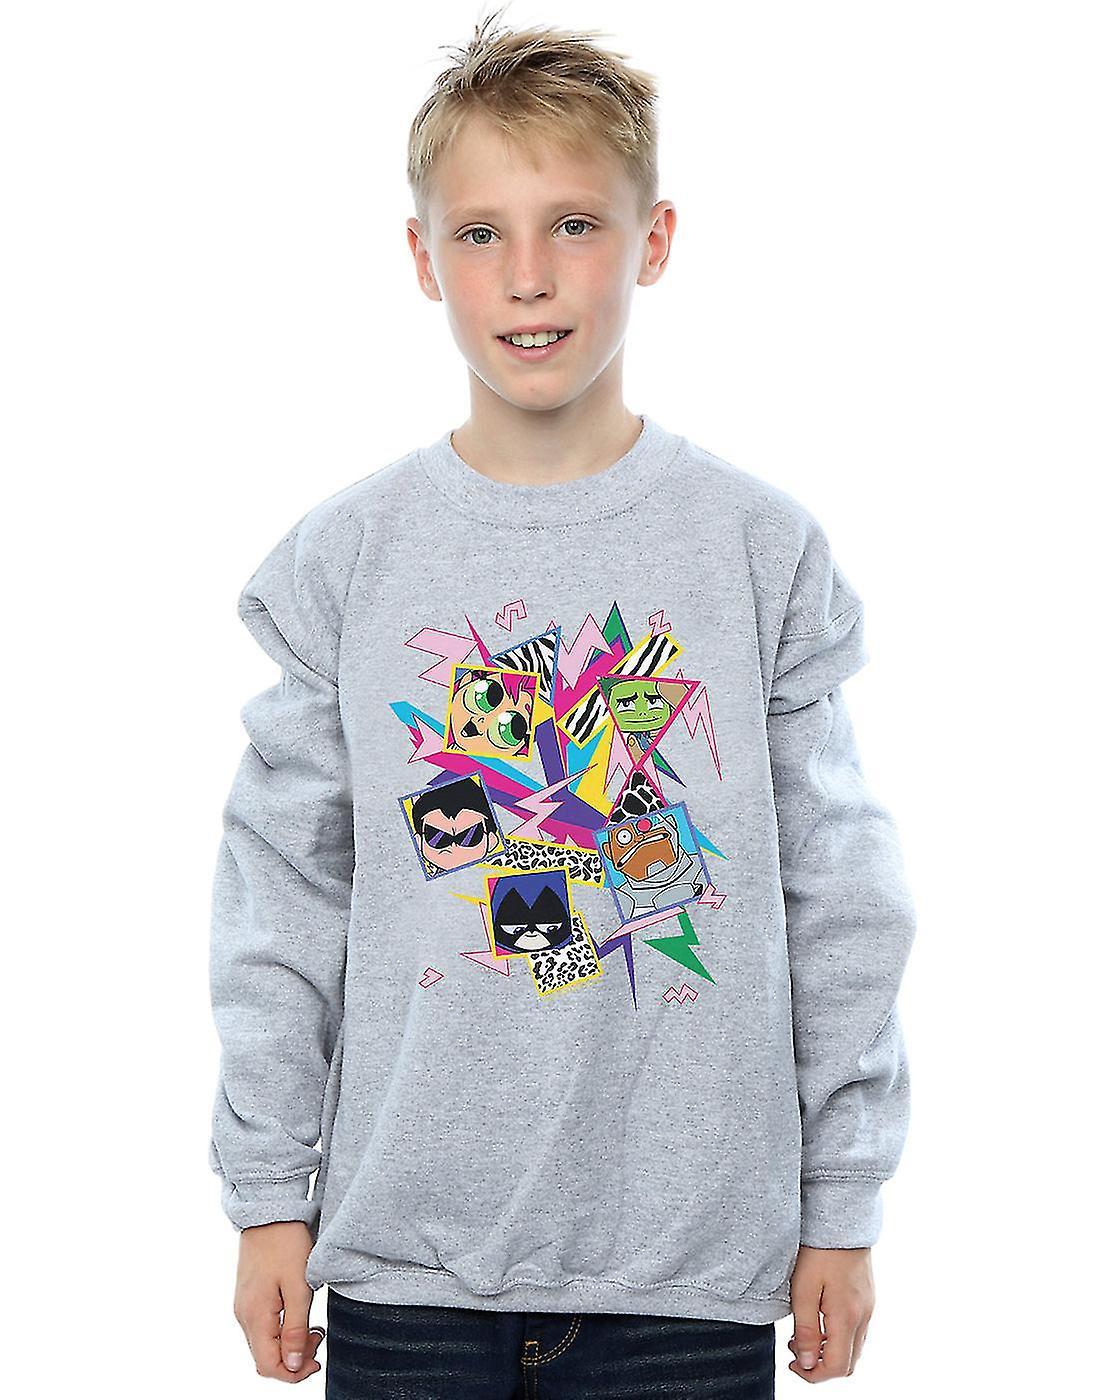 DC Comics Boys Teen Titans Go 80s Icons Sweatshirt